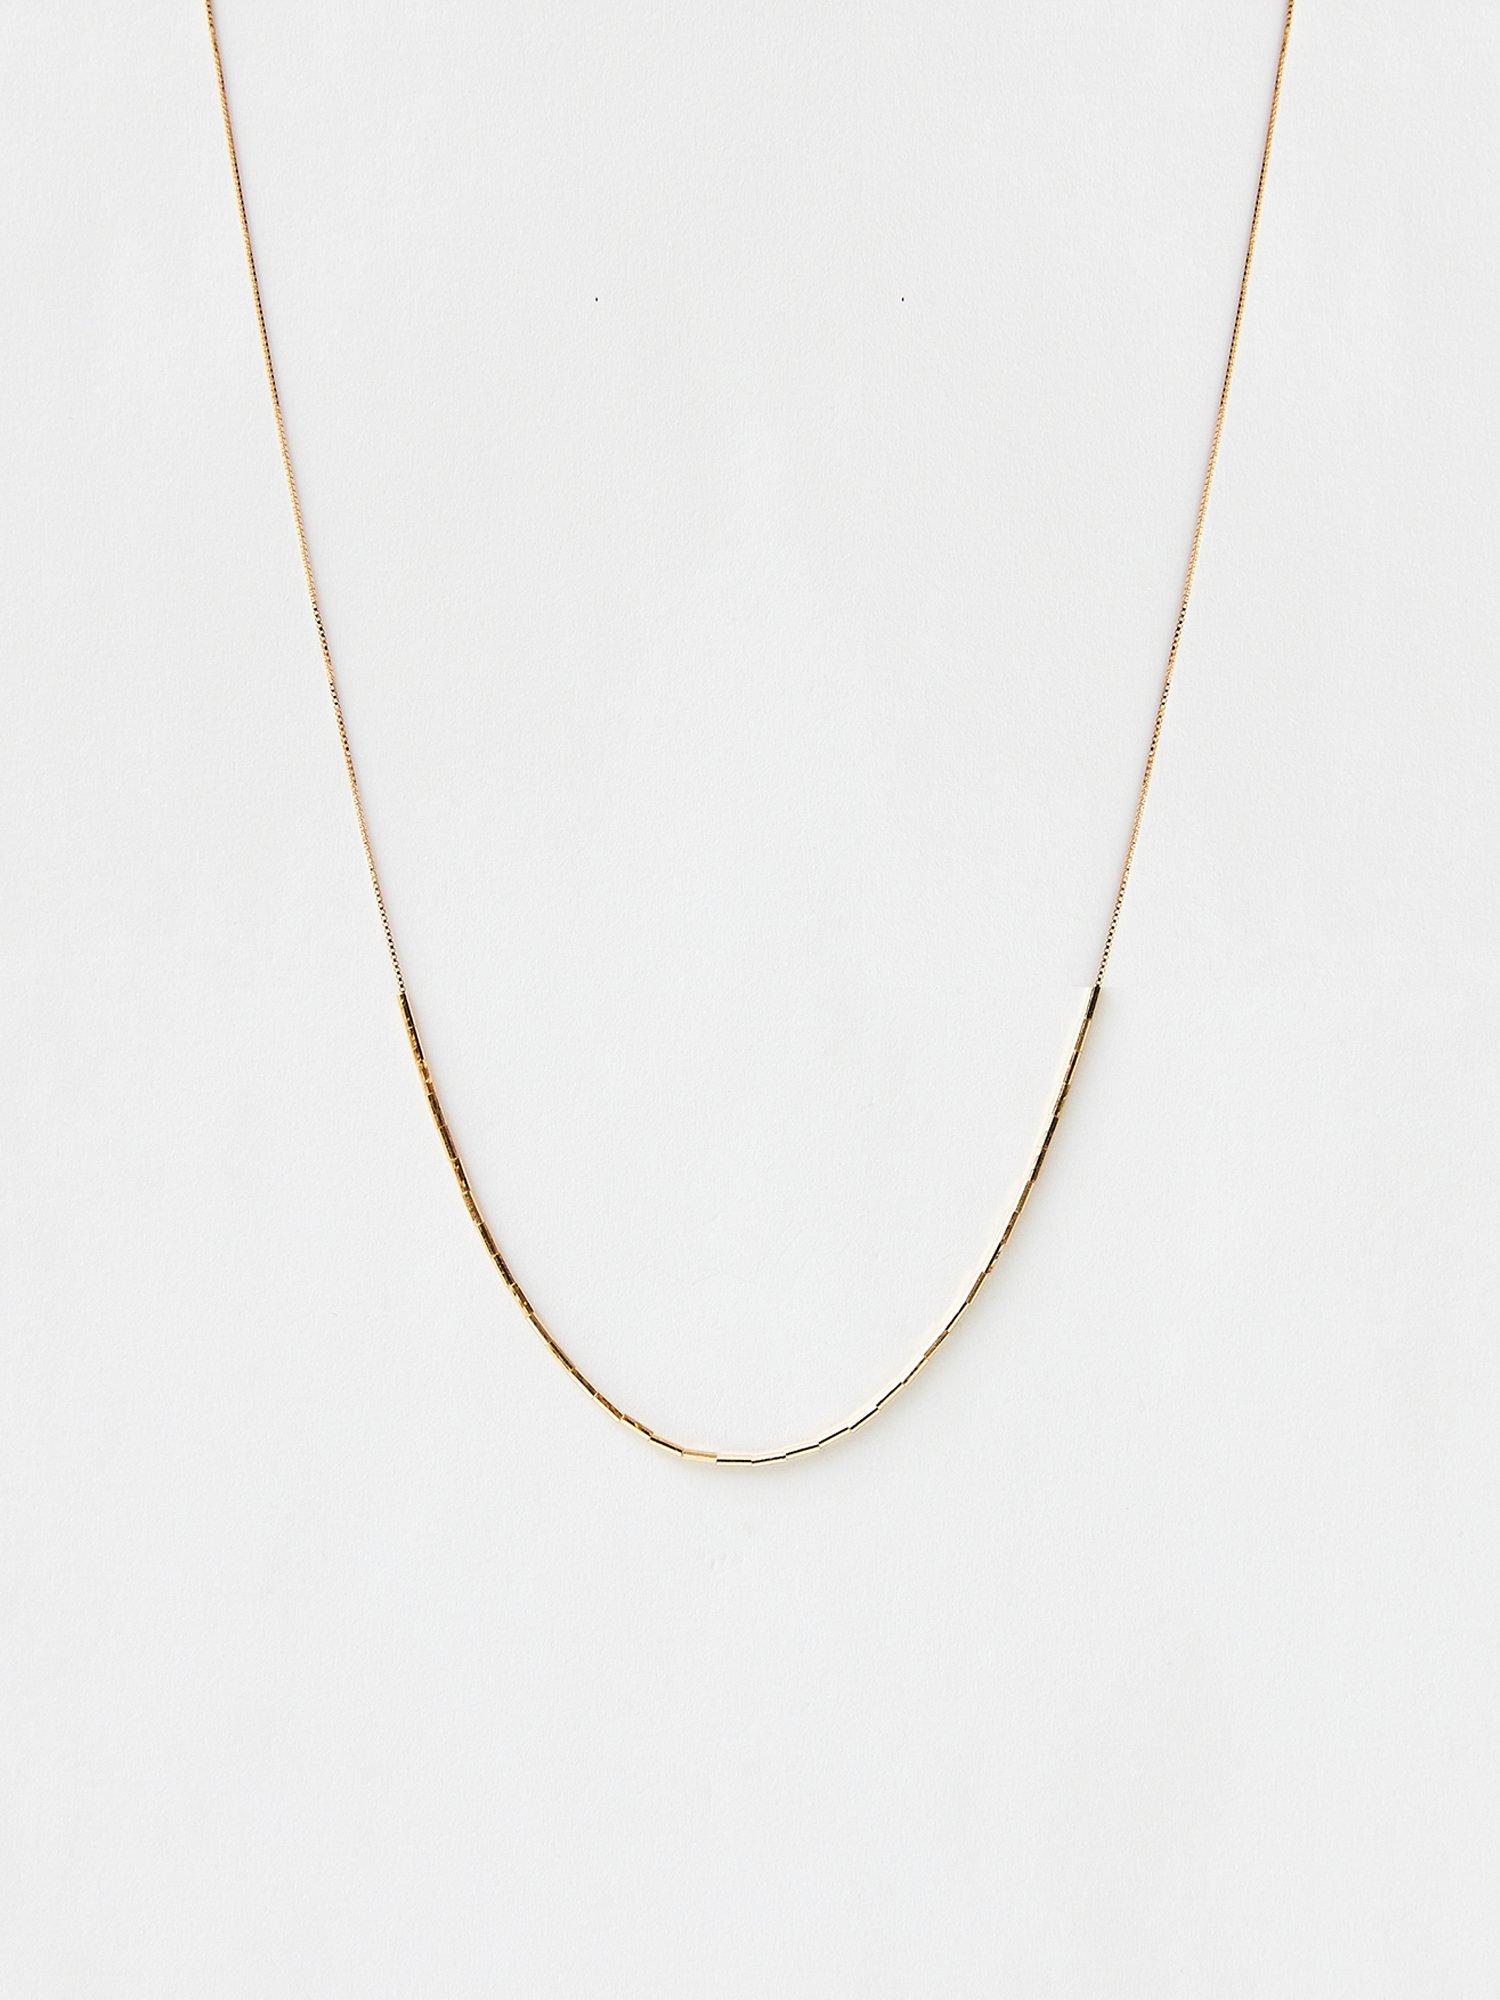 HISPANIA / Dazzling short chain necklace/ 380mm